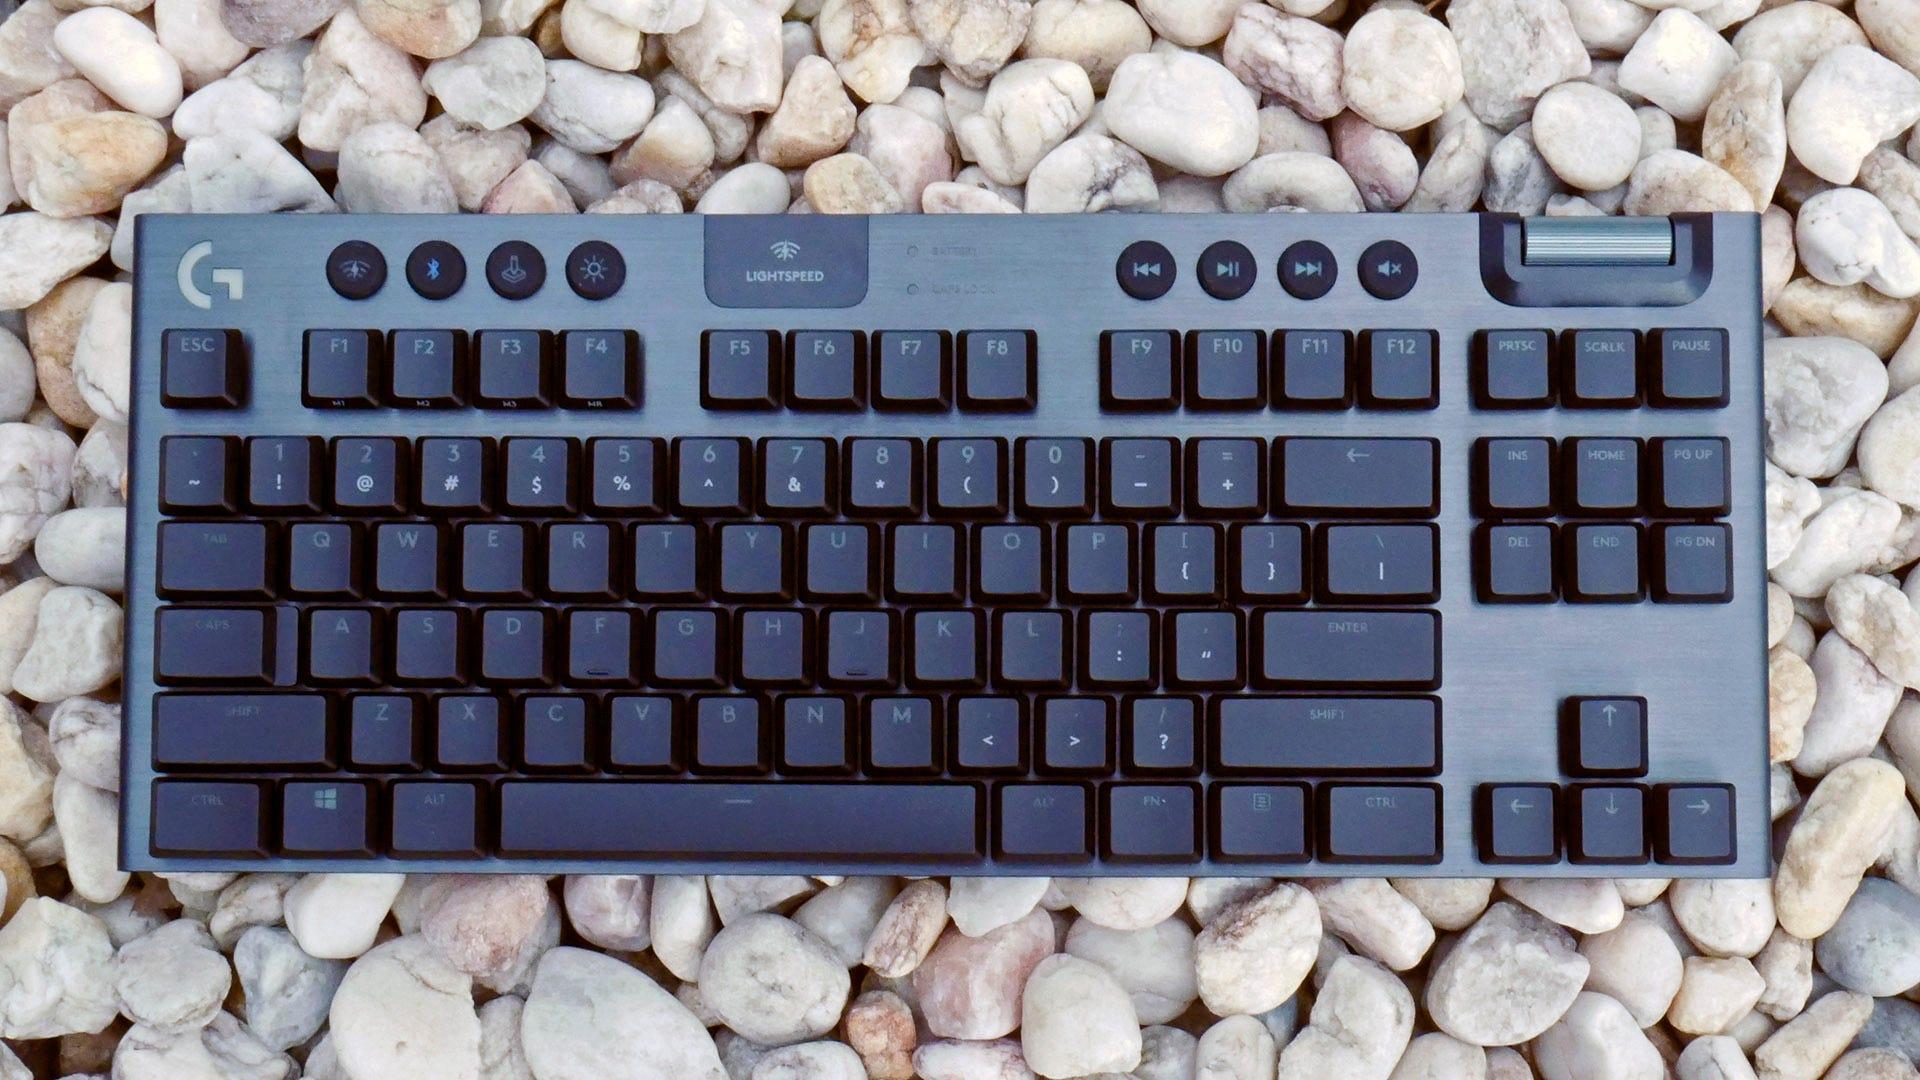 Logitech G915 TKL